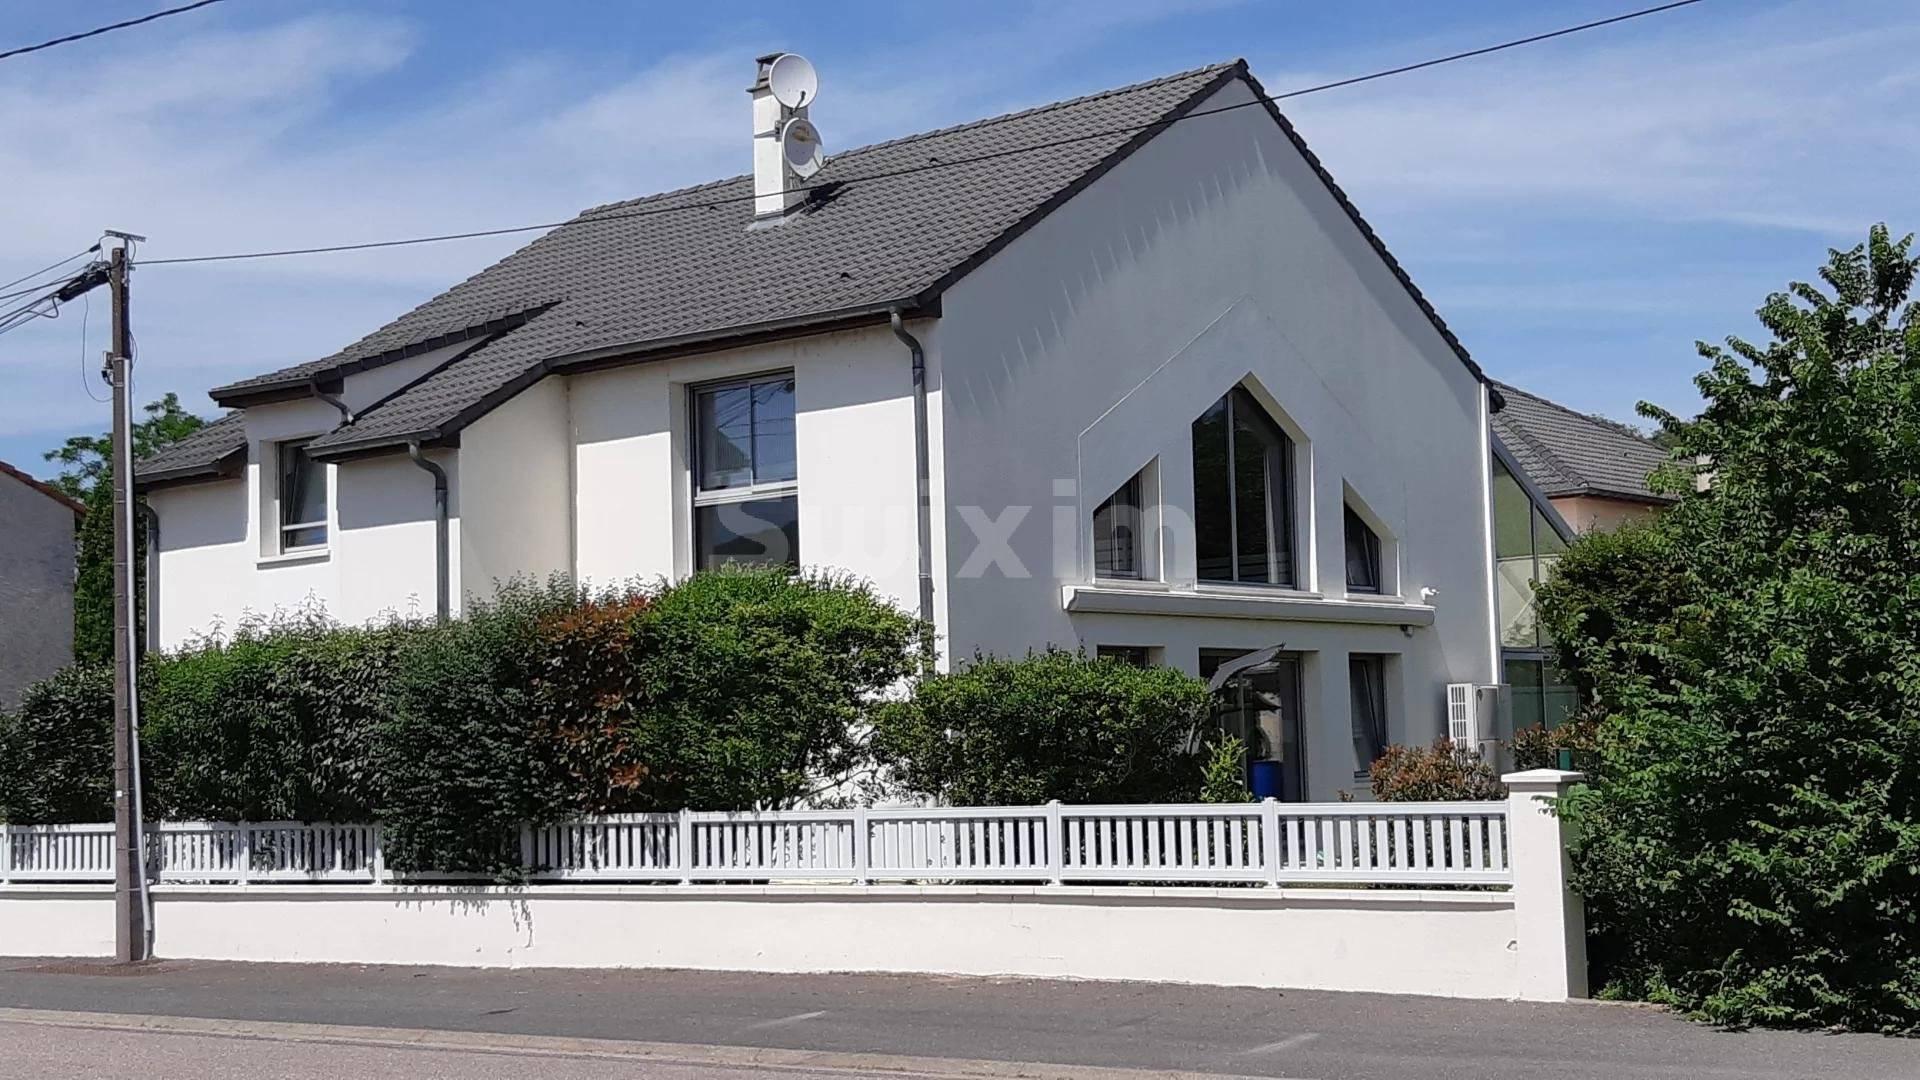 1 88 Flavigny-sur-Moselle